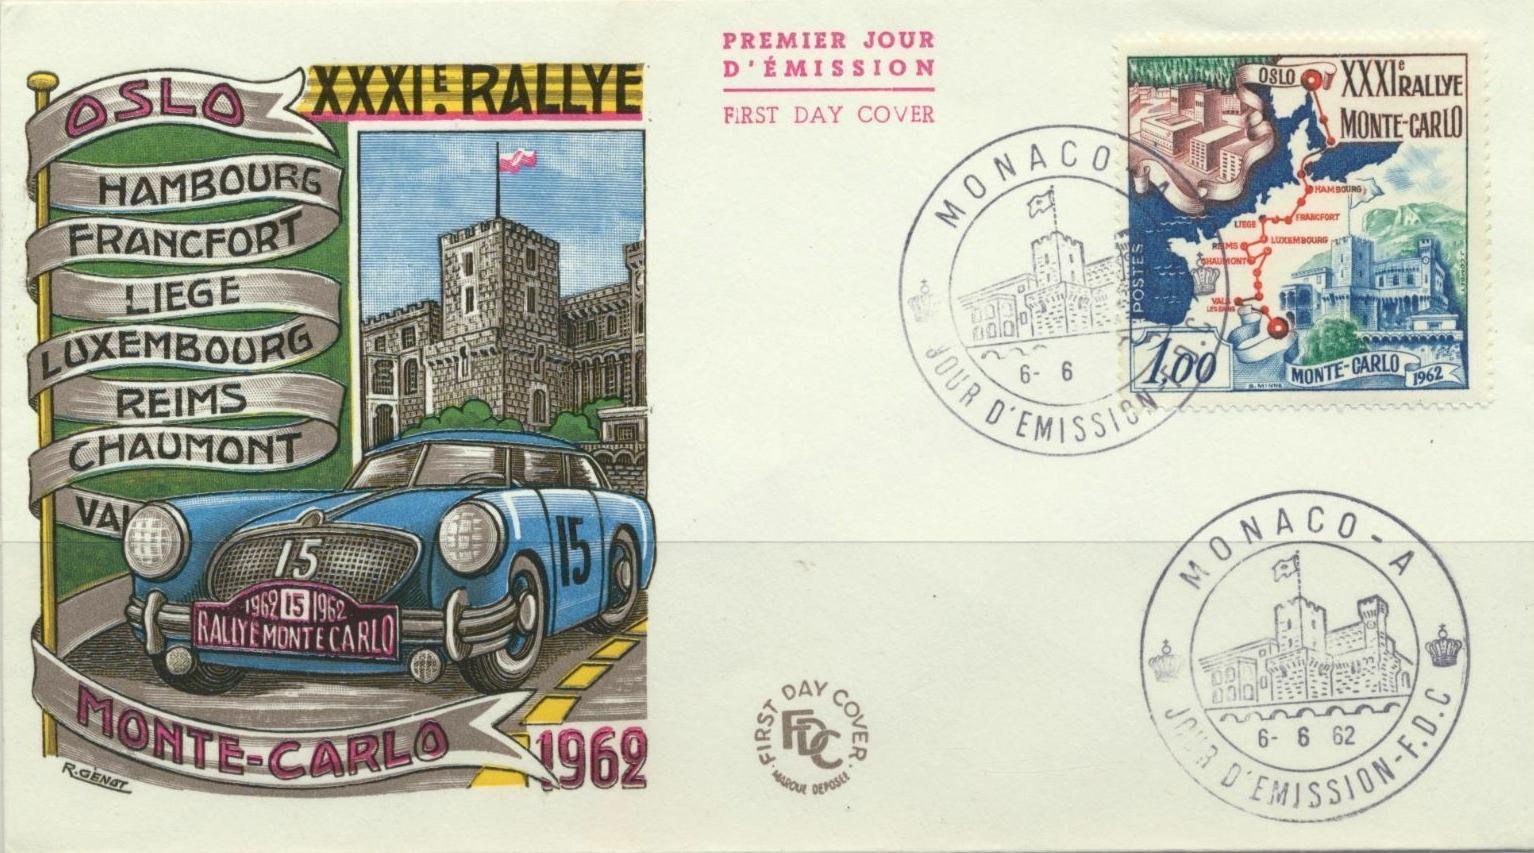 Monaco - Scott #500 (1962) first day cover